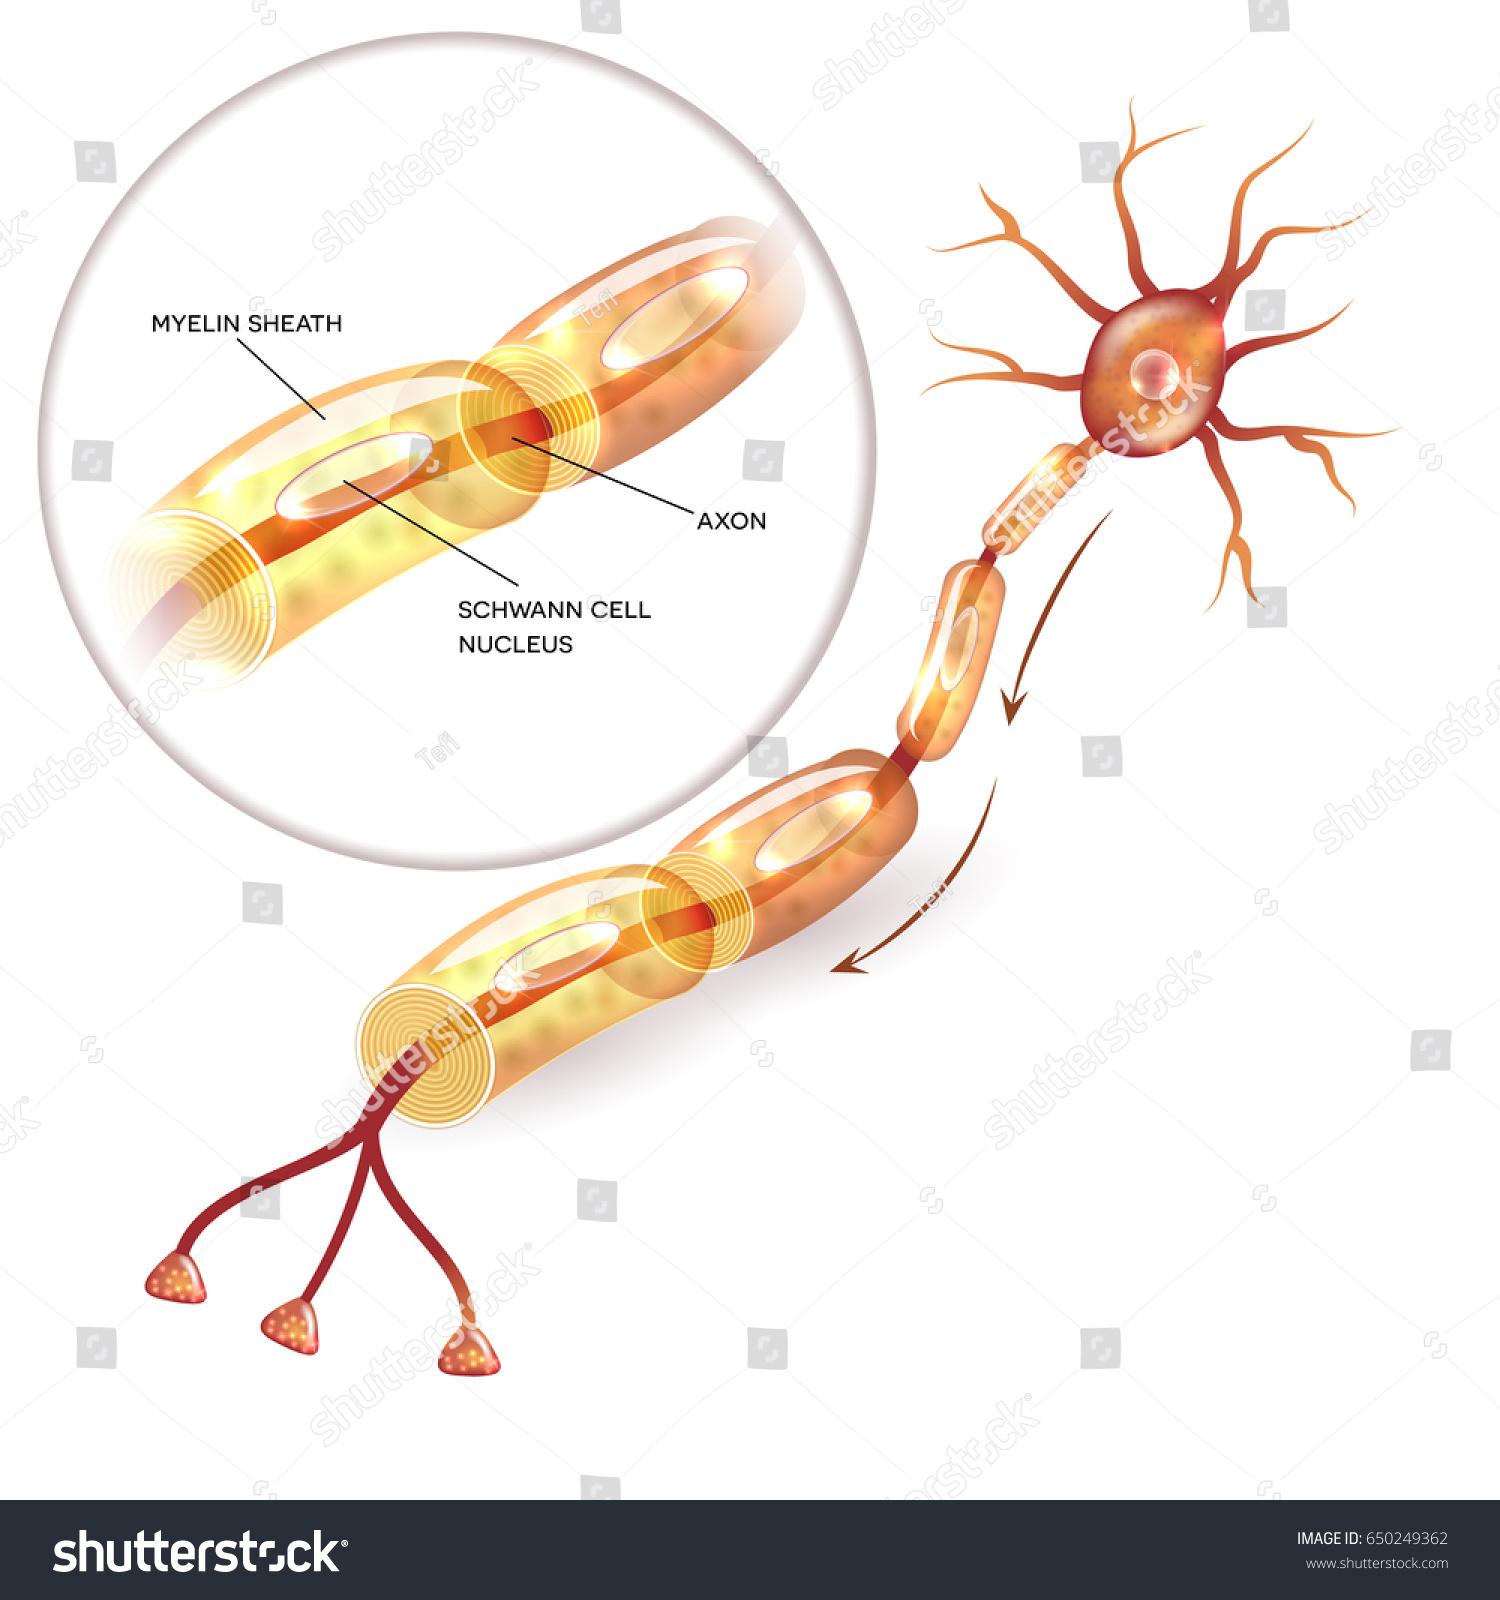 Neuron Nerve Cell Axon Myelin Sheath Stock Illustration 650249362 ...